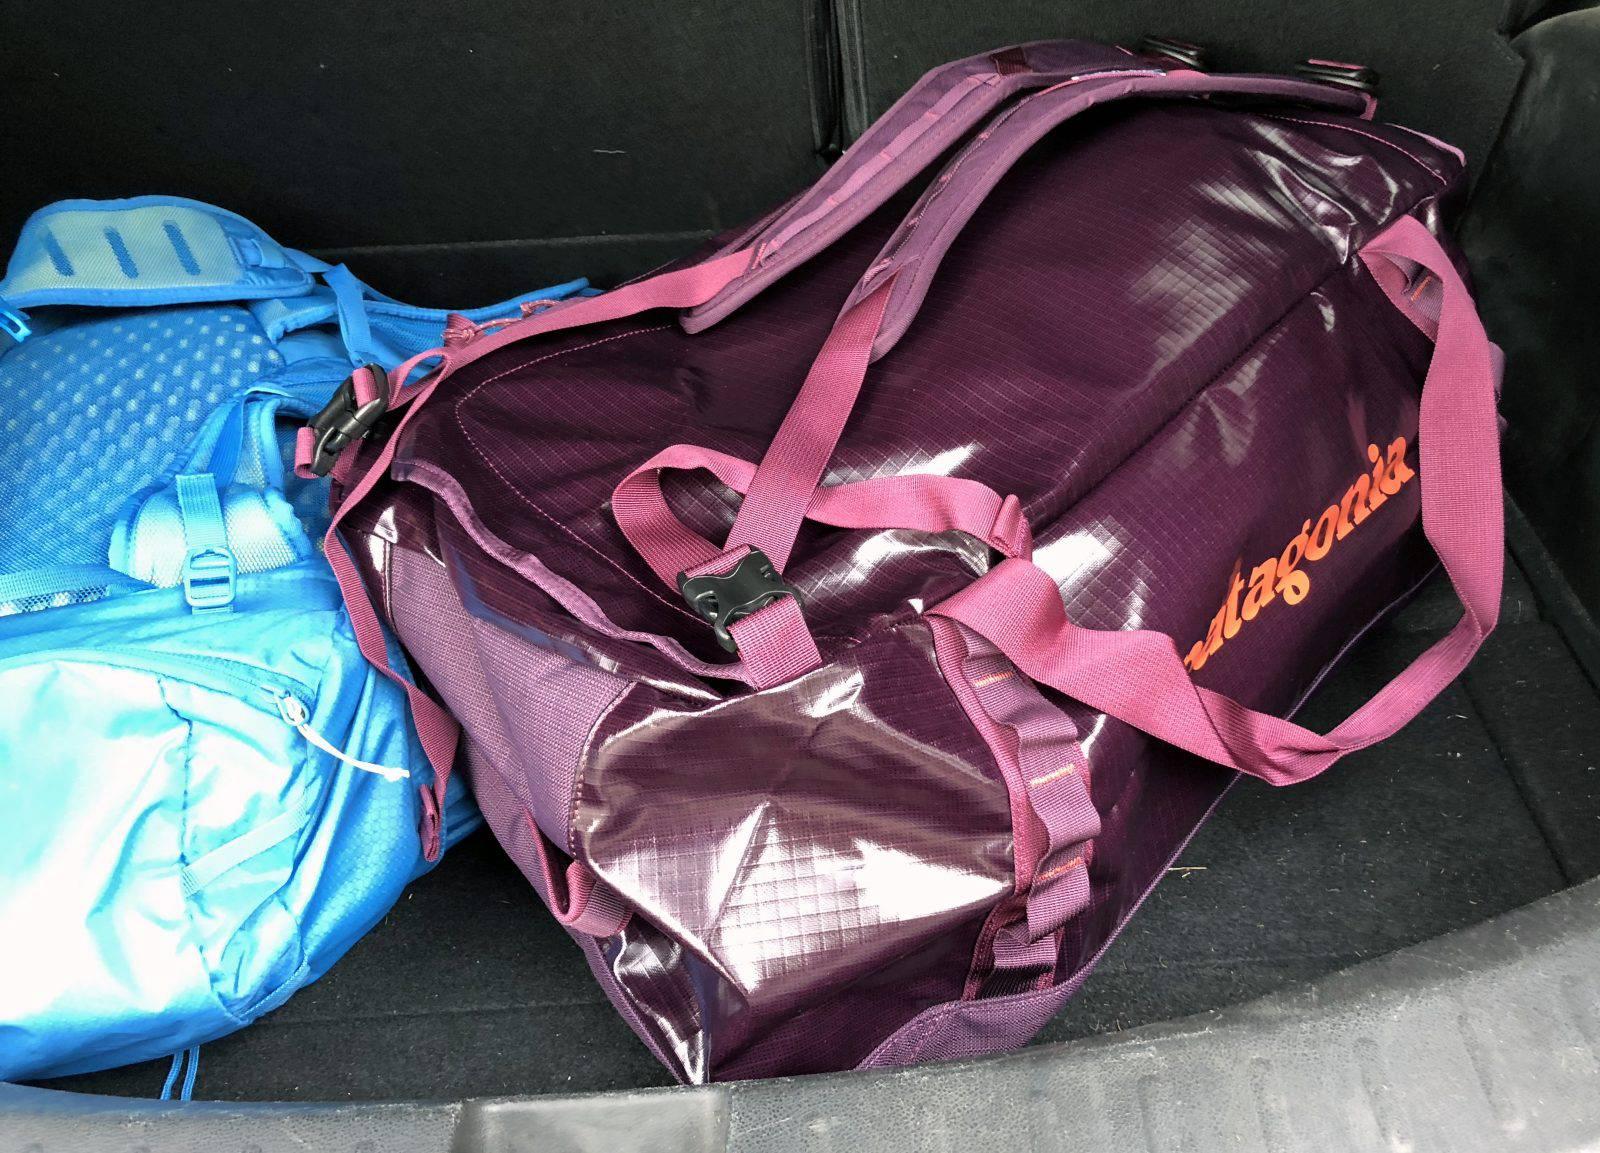 La borsa Patagonia Black Hole Duffel Bag nel bagagliaio